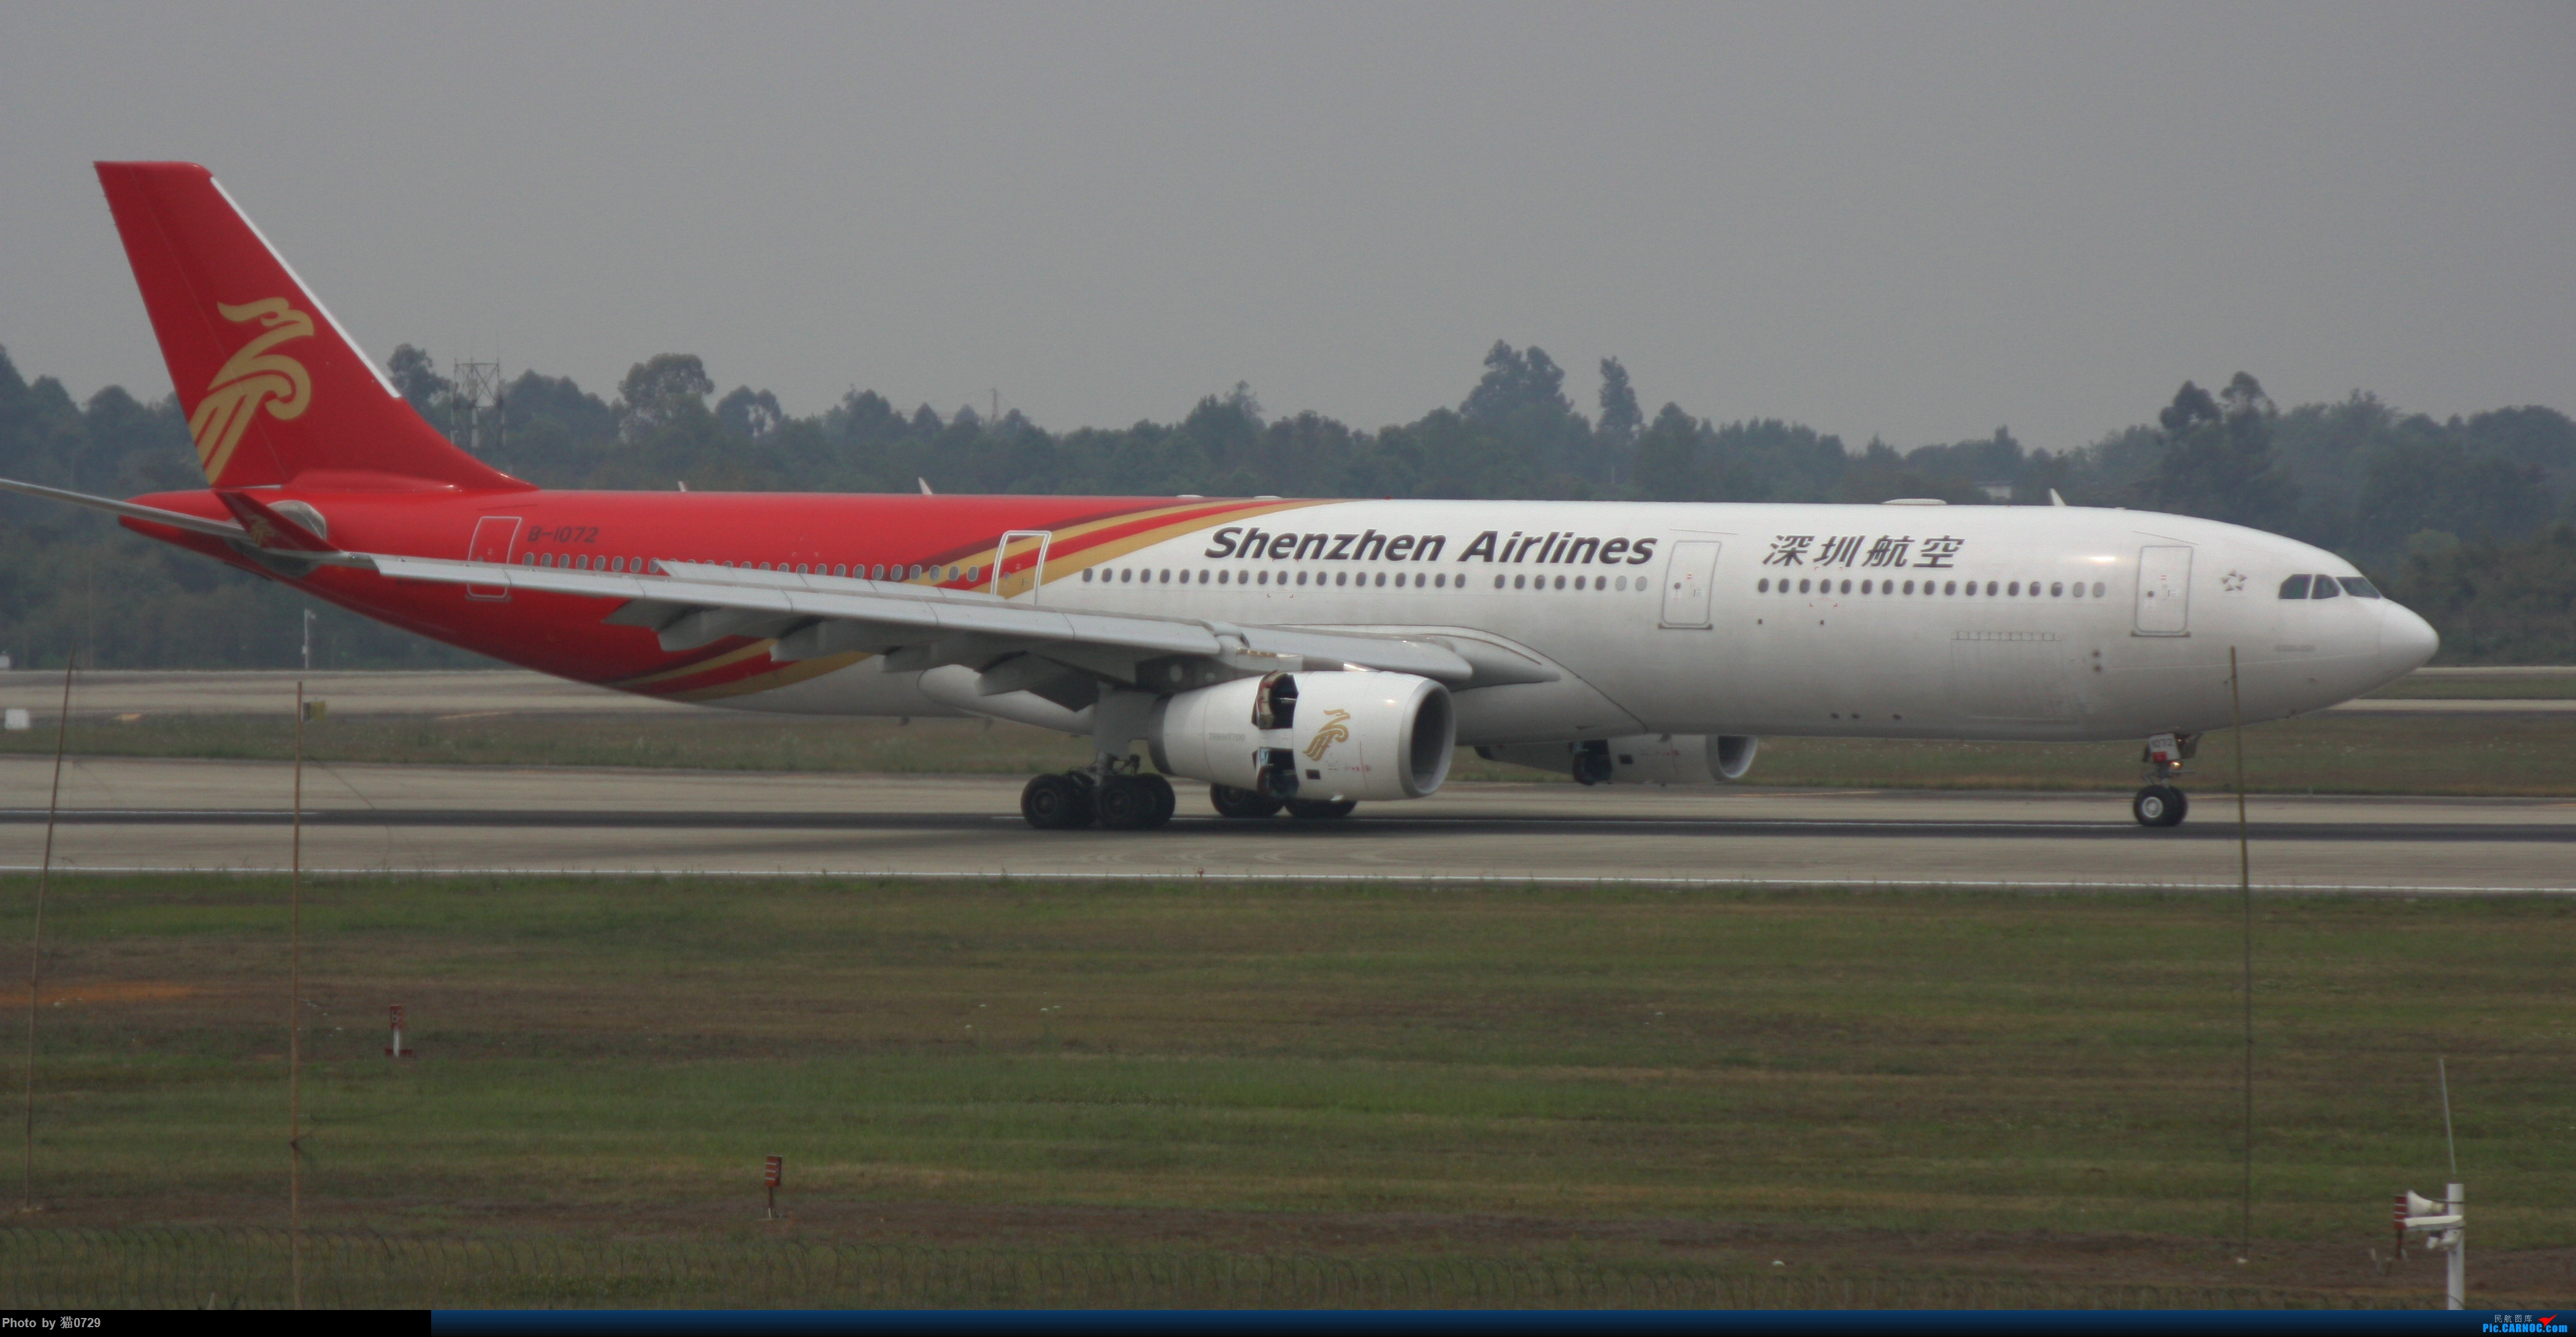 Re:[原创]CTU 119.425 水泥 伊朗346 巴基斯坦777 AIRBUS A330-300 B-1072 中国成都双流国际机场